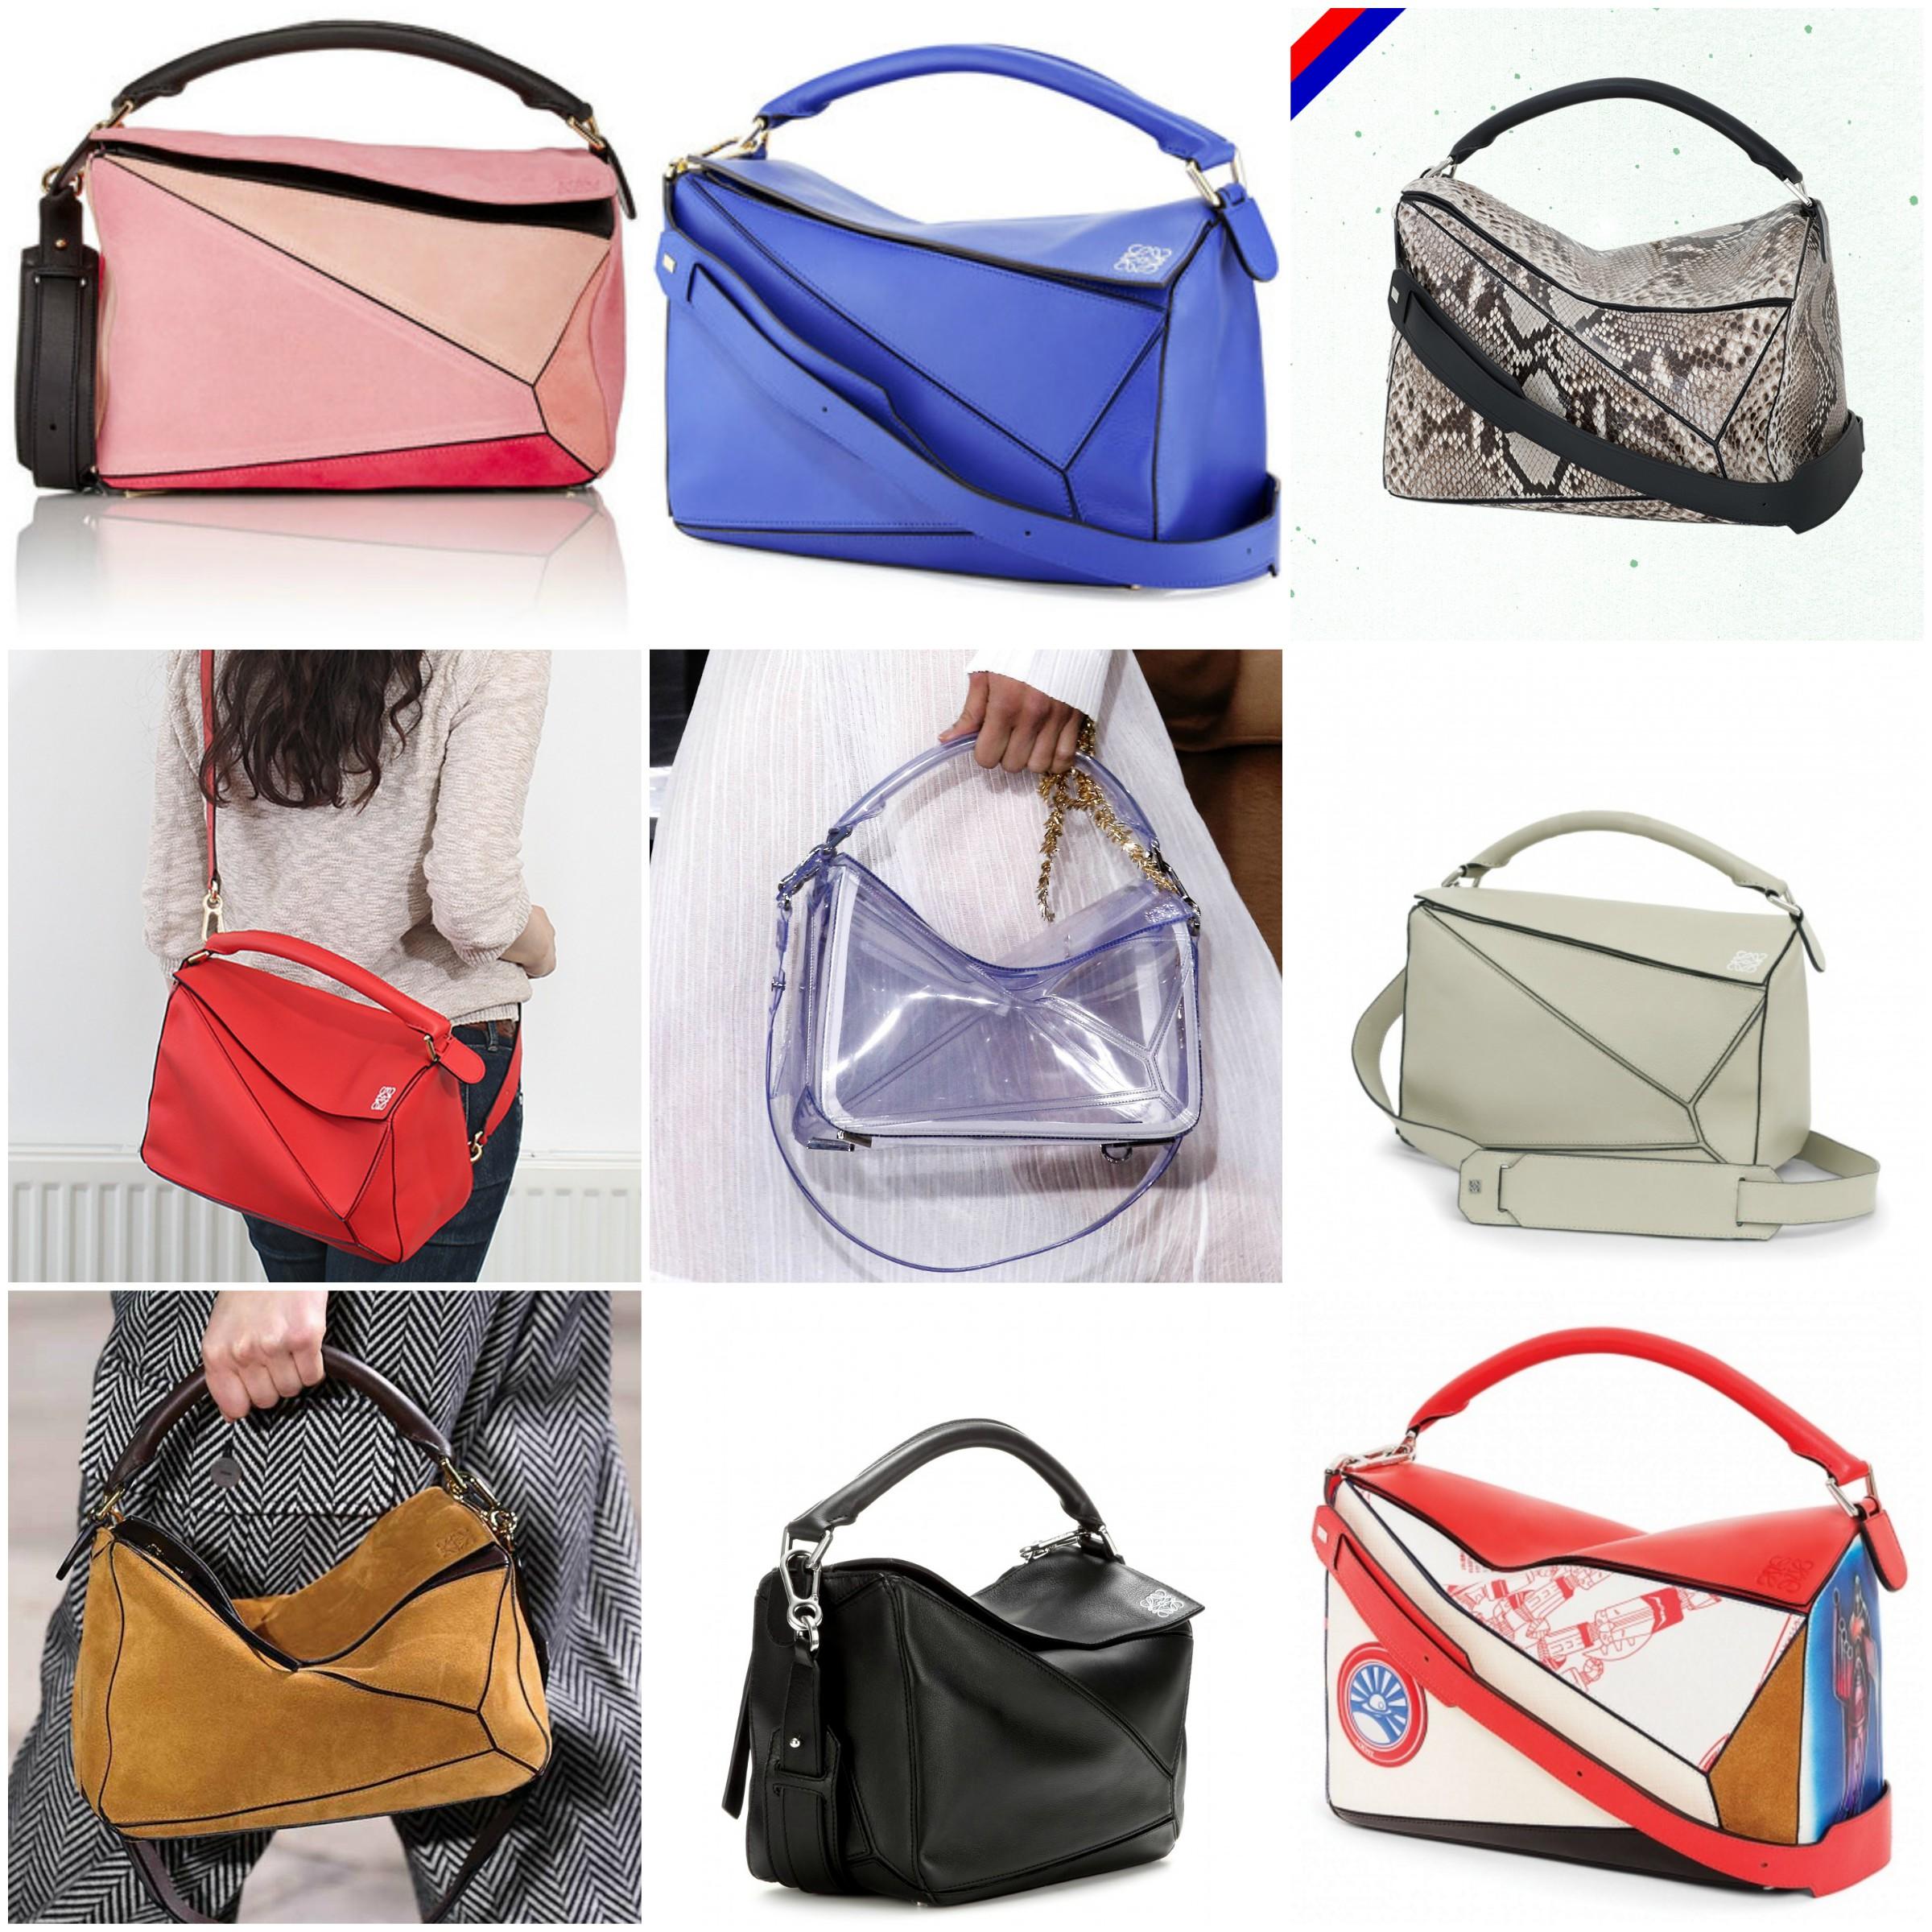 Dream Bag Of 2016 Loewe S Puzzle Bag Asian Fashionistas